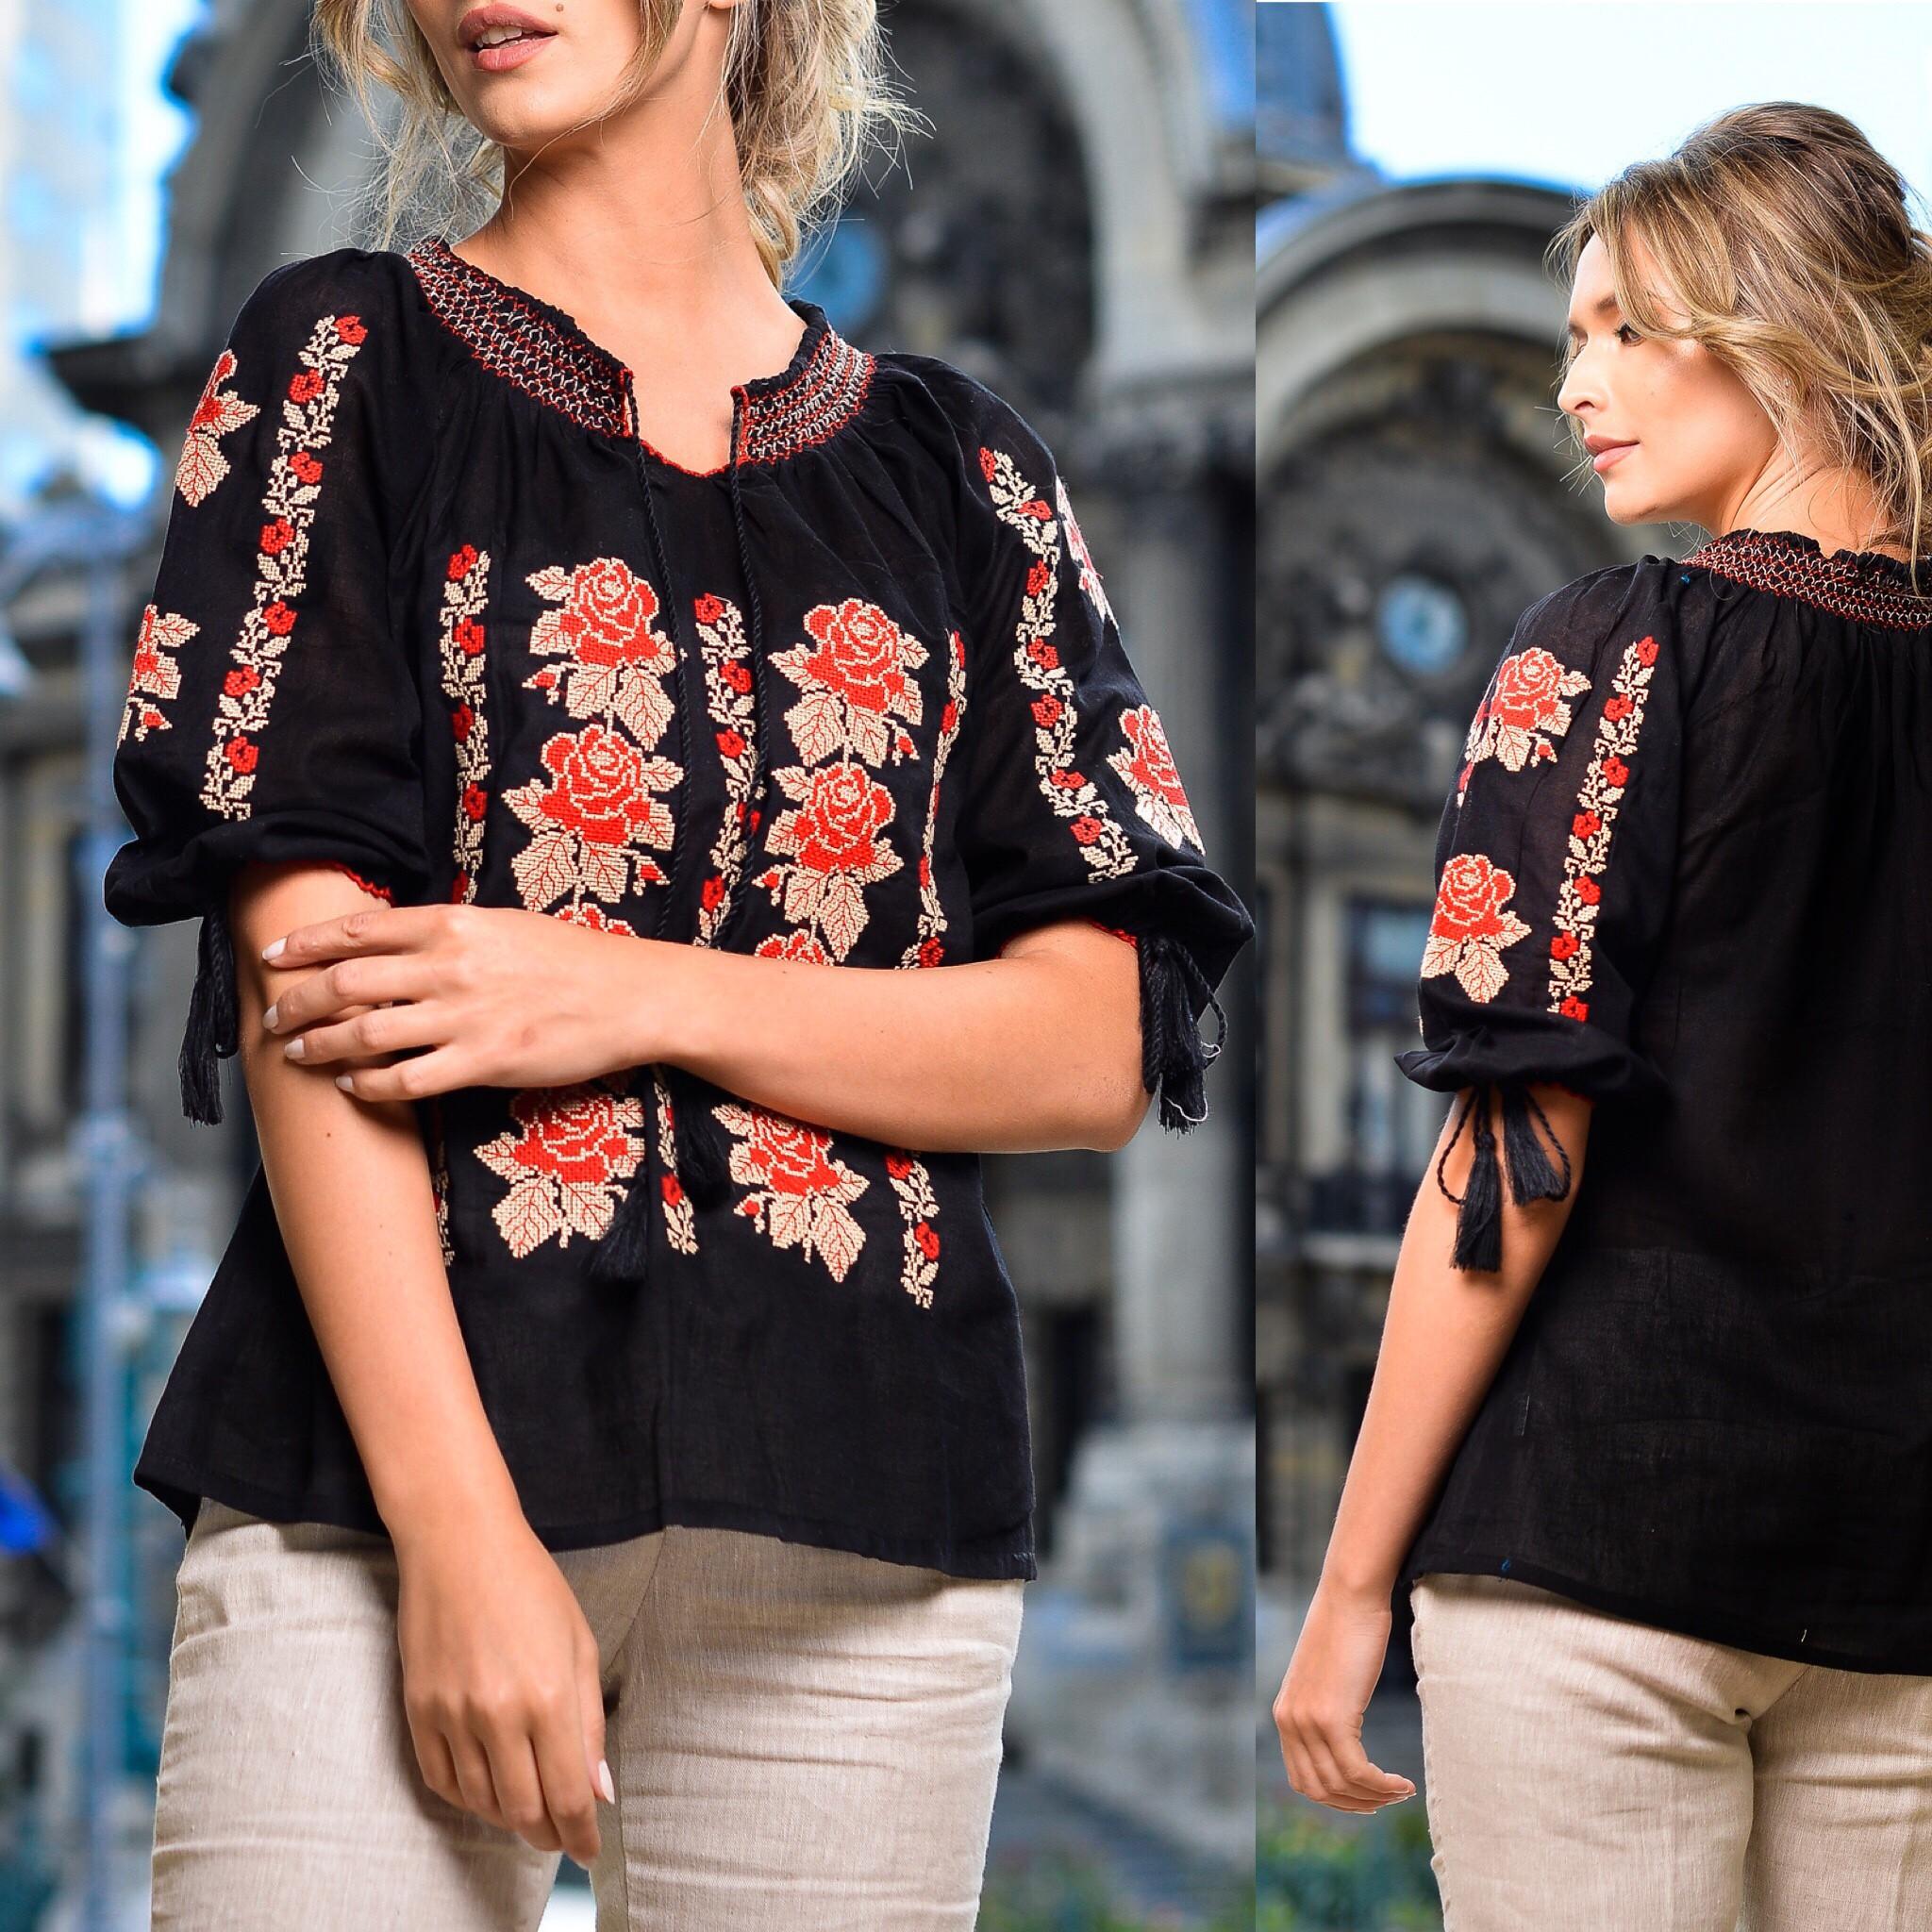 IE Nationala neagra cu broderie florala rosie - Andreea